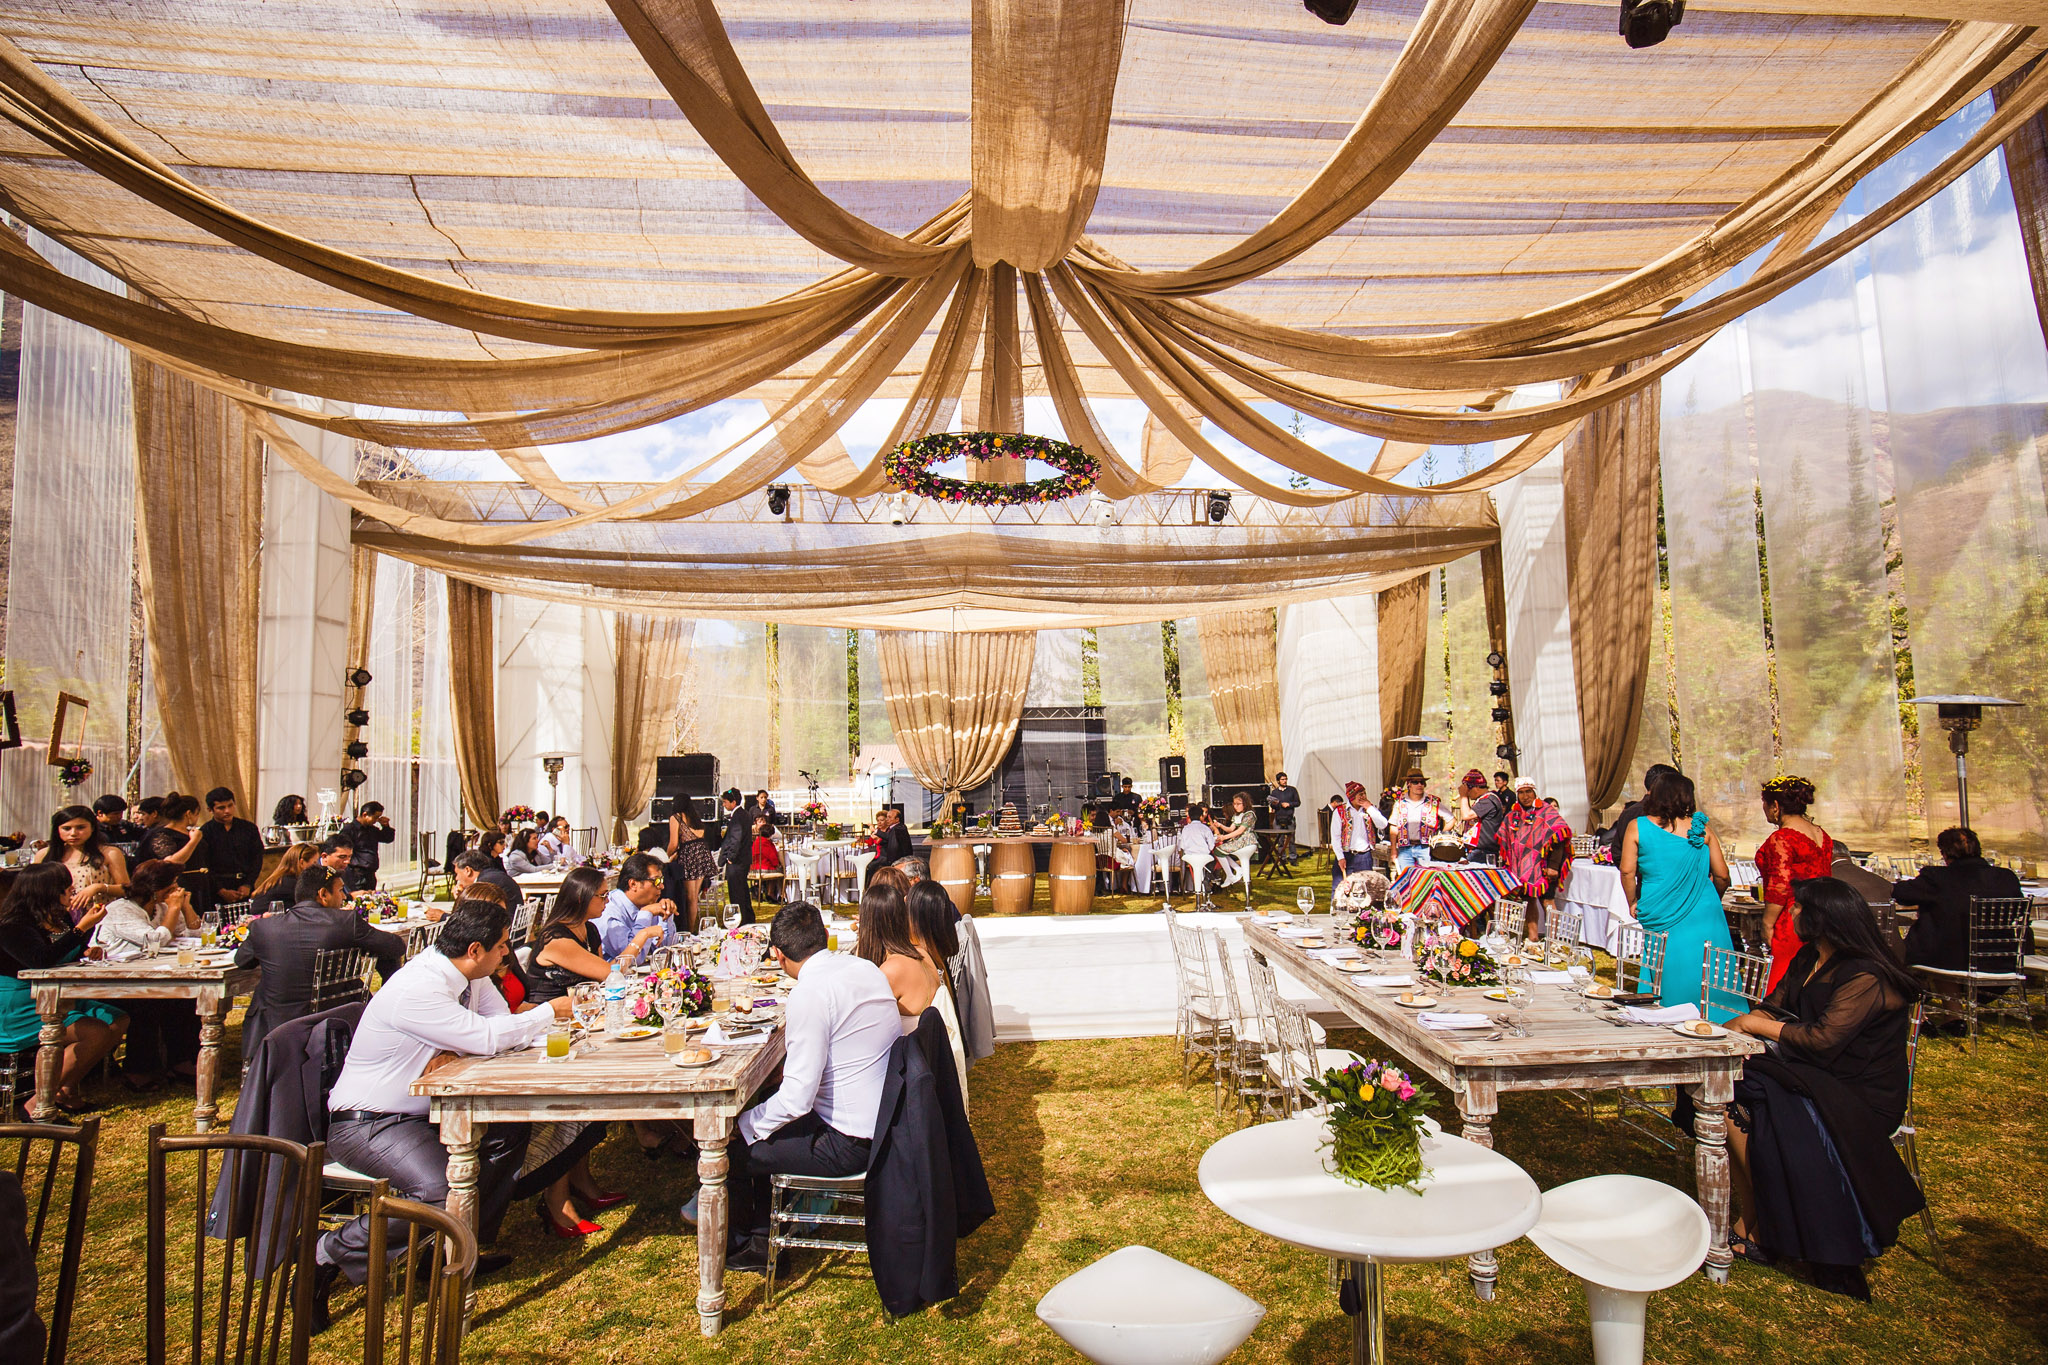 Wedding-Travellers-Destination-Wedding-Peru-Cusco-Hacienda-Sarapampa-Sacred-Valley-reception